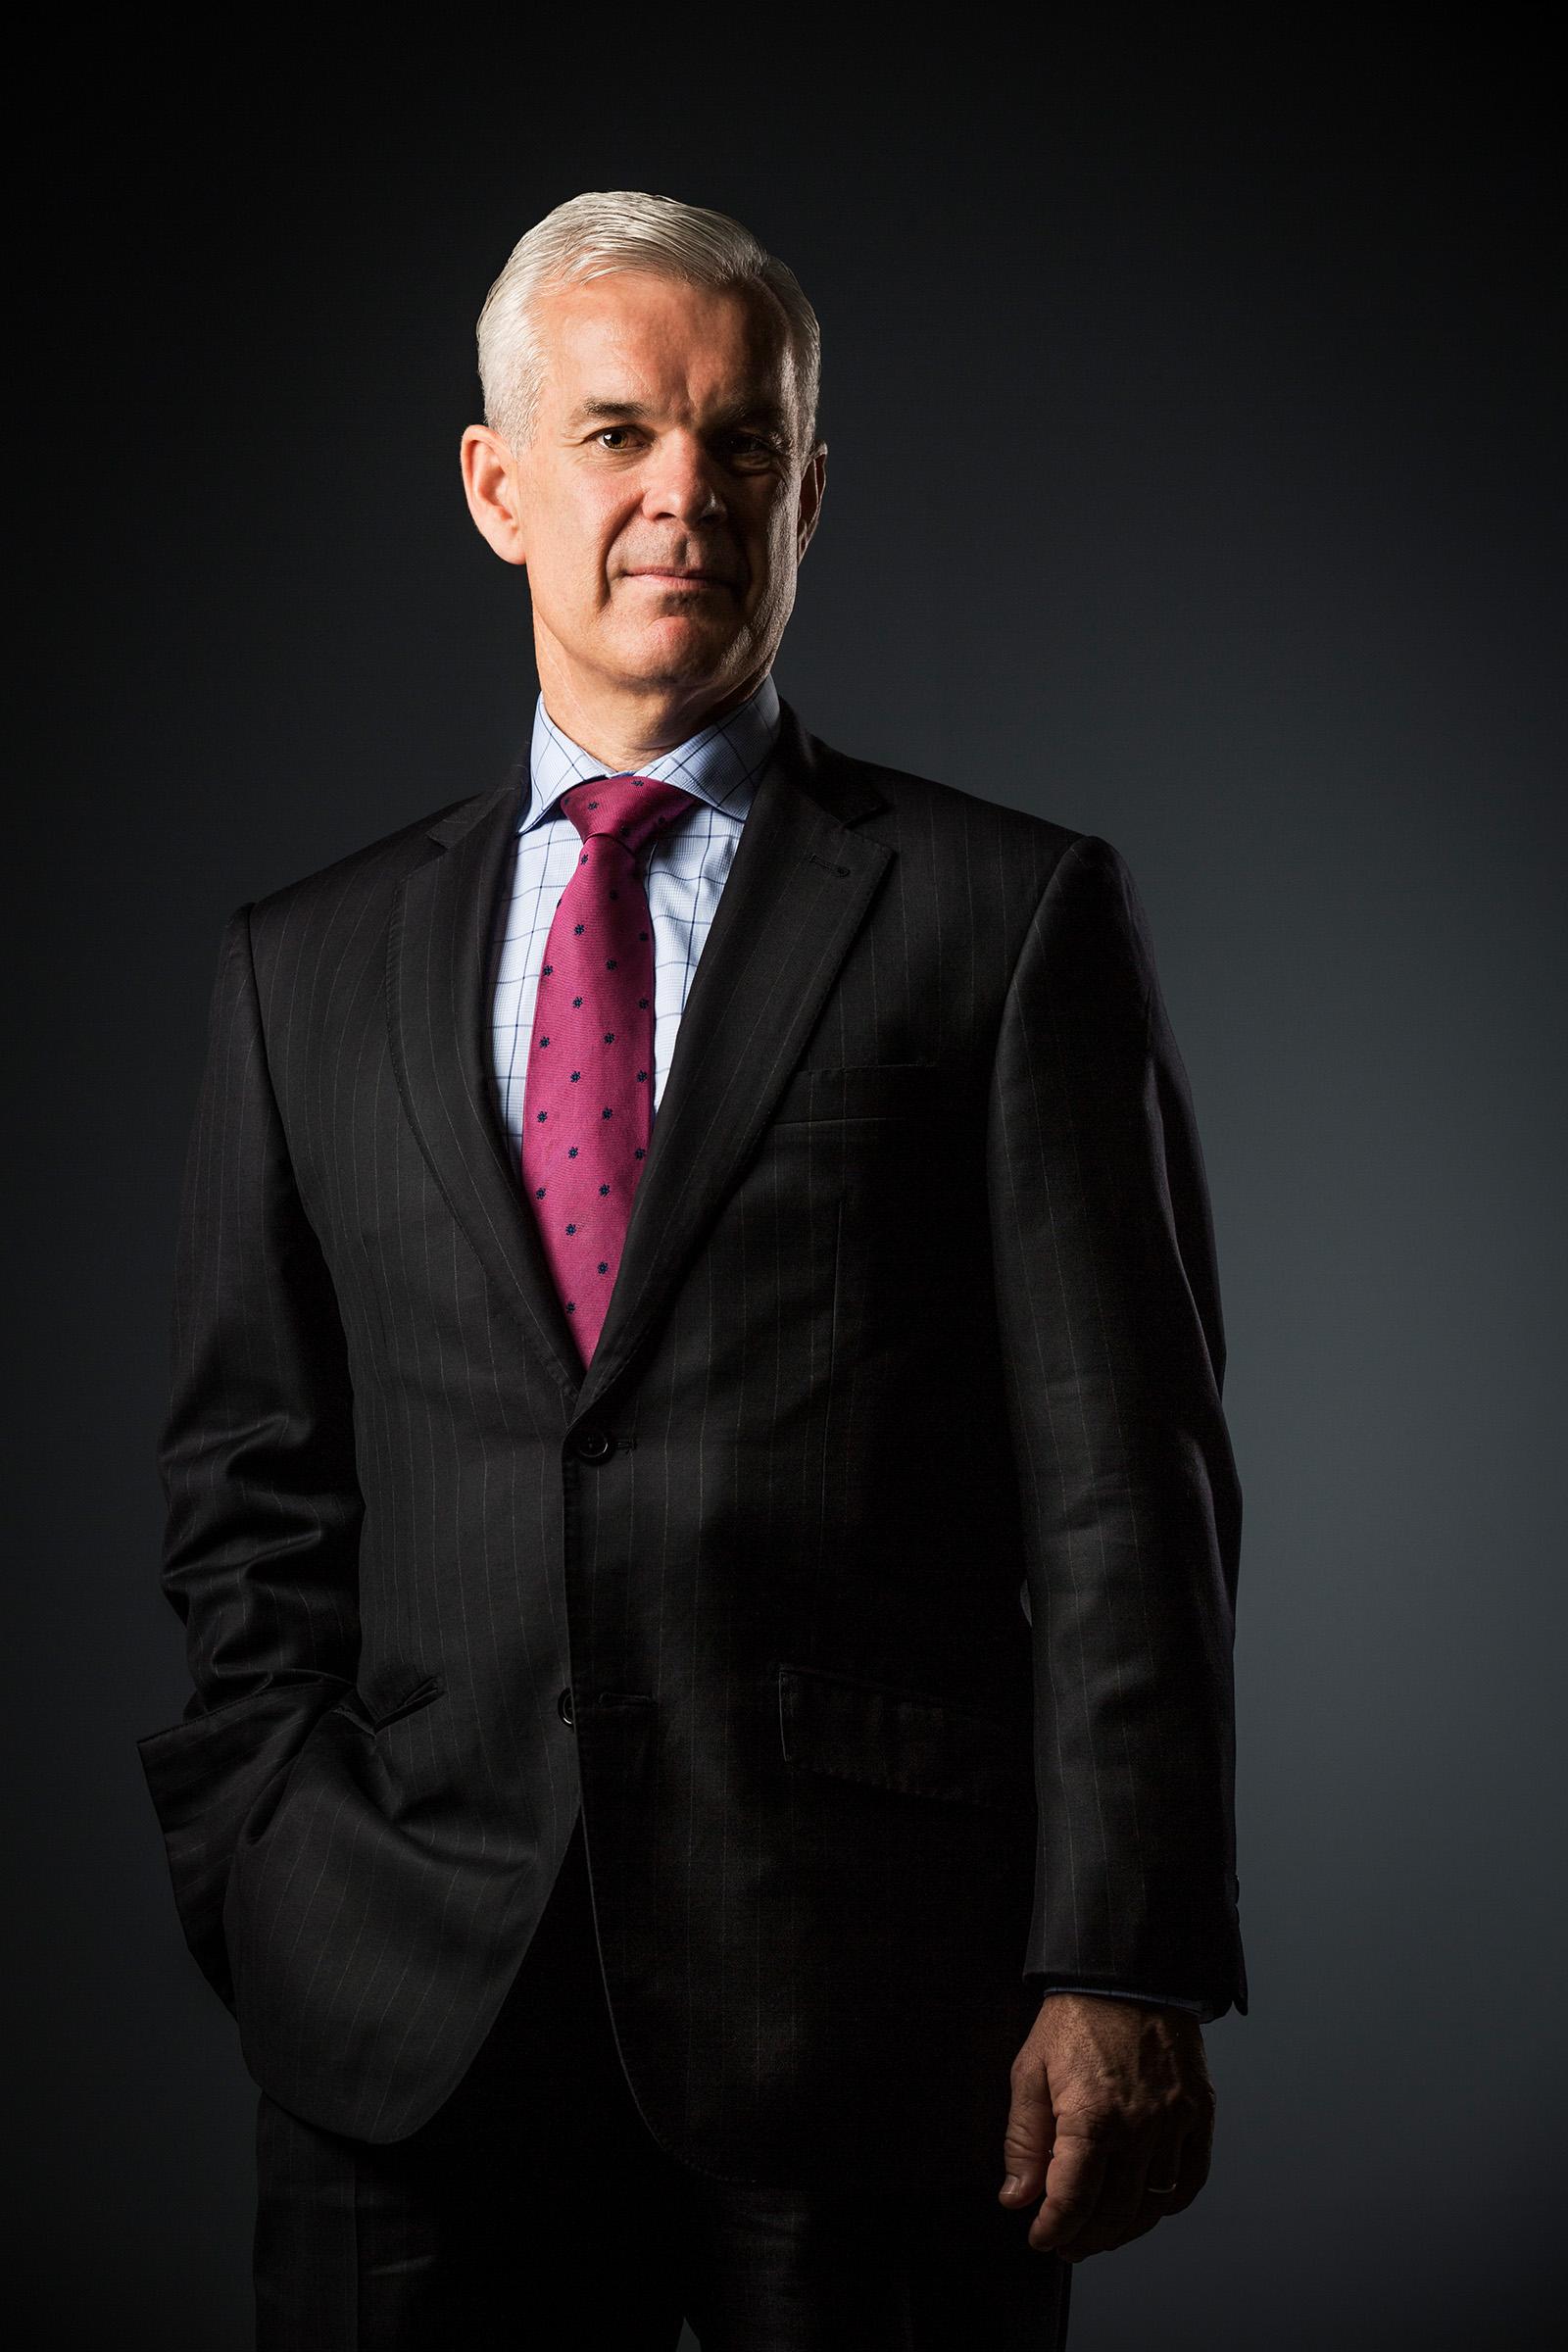 Corporate studio portrait David Hosking Allianz grey graduated background hand in pocket wearing business suit